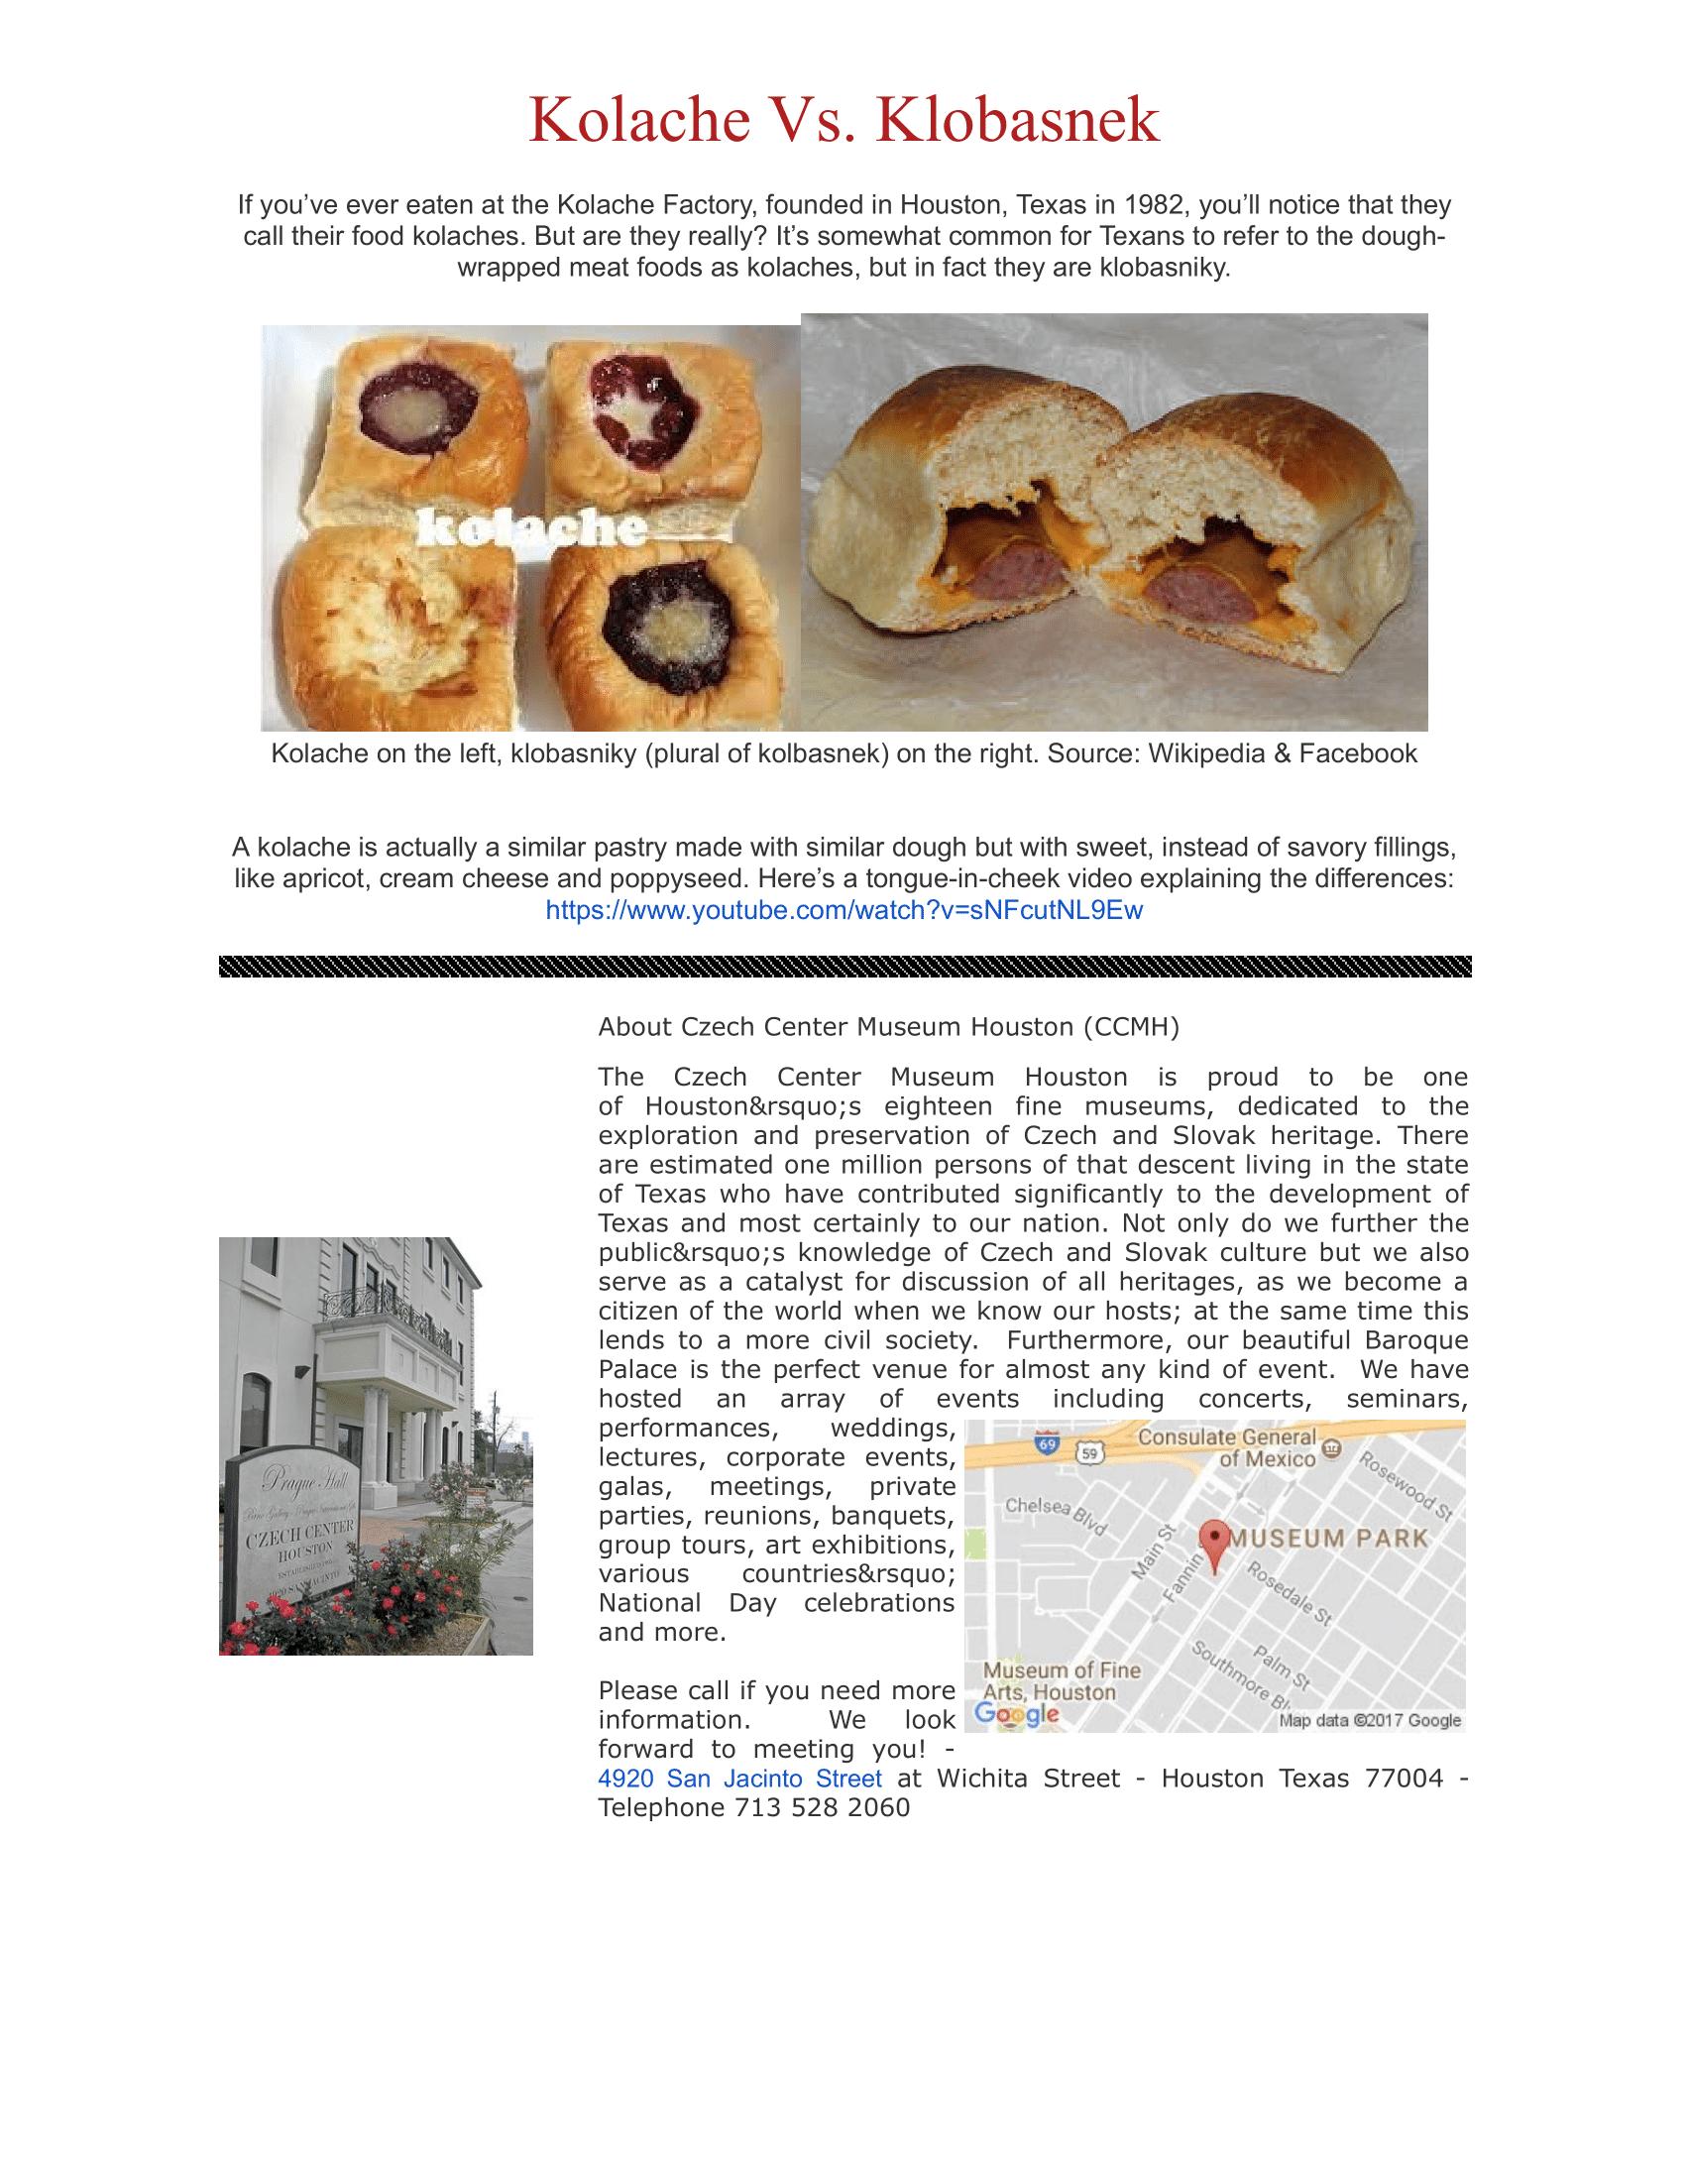 Czech Center Museum Houston Mail - CCMH august-september Newsletter-7.png